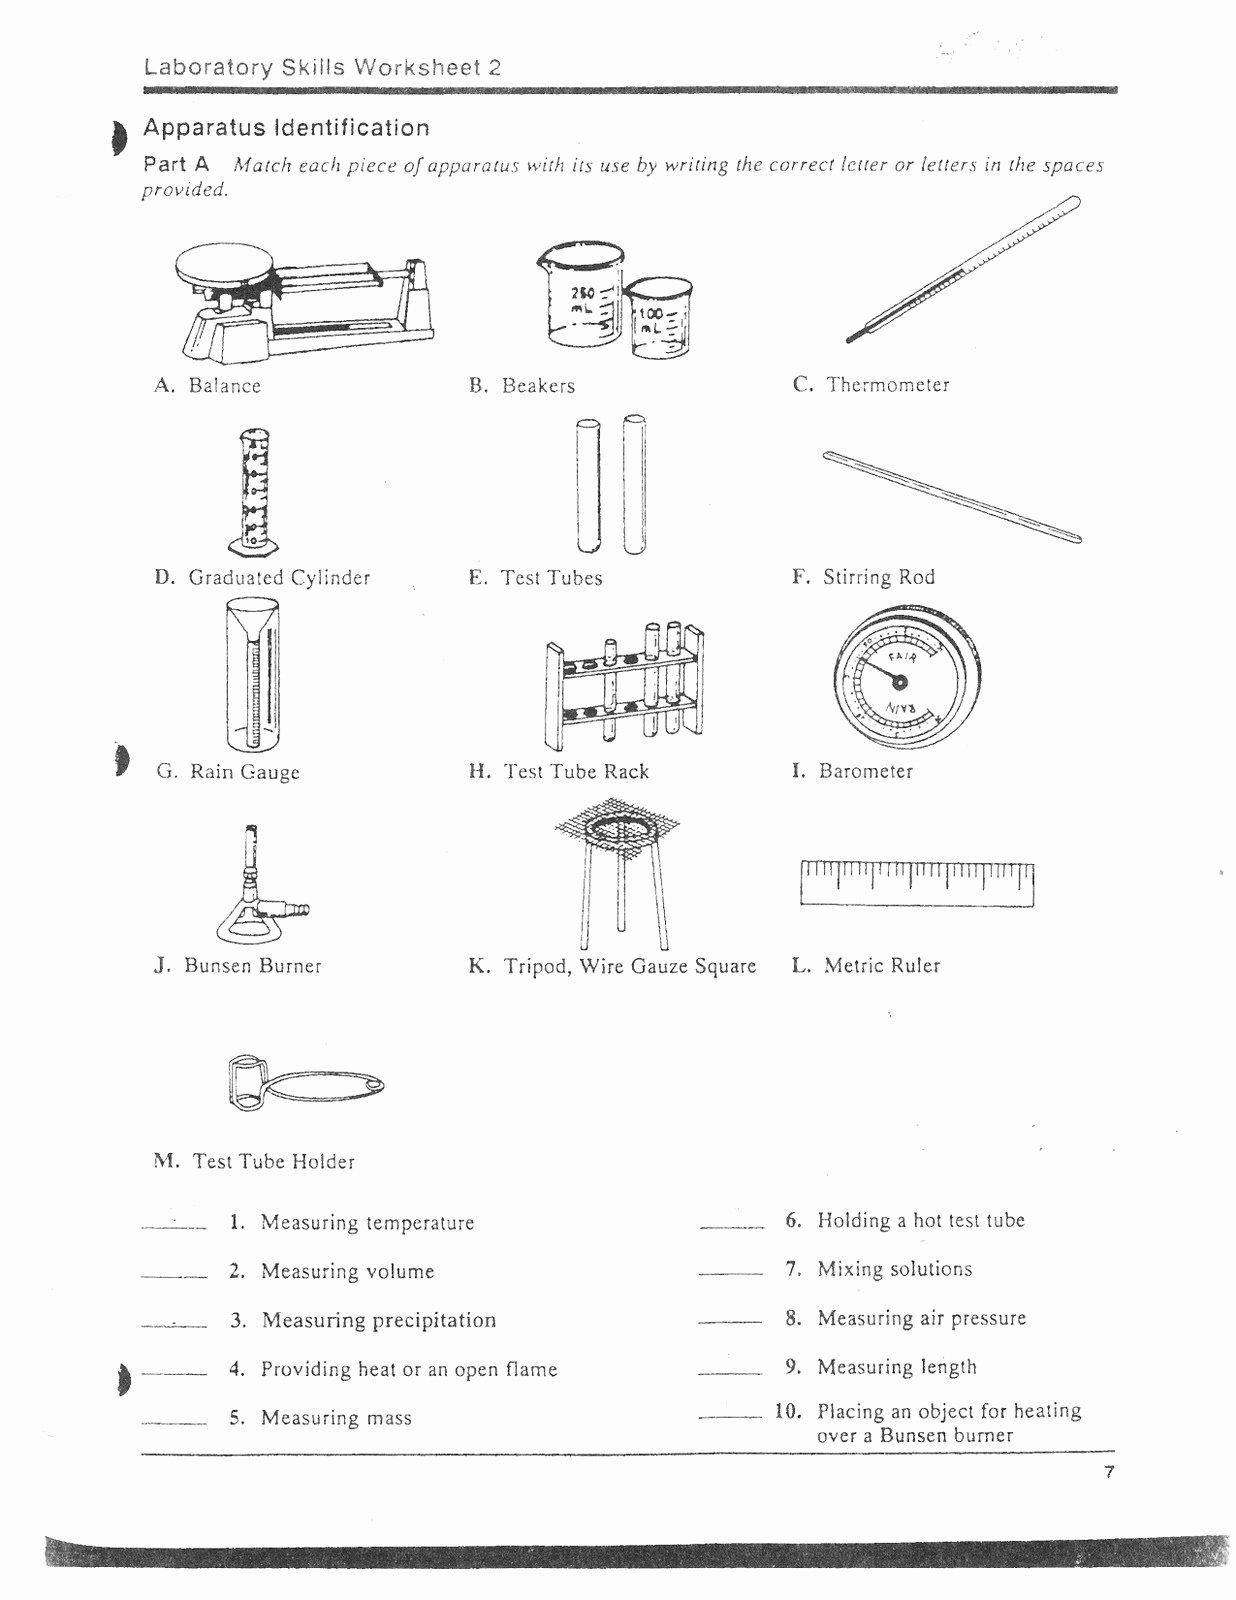 50 Lab Equipment Worksheet Answers